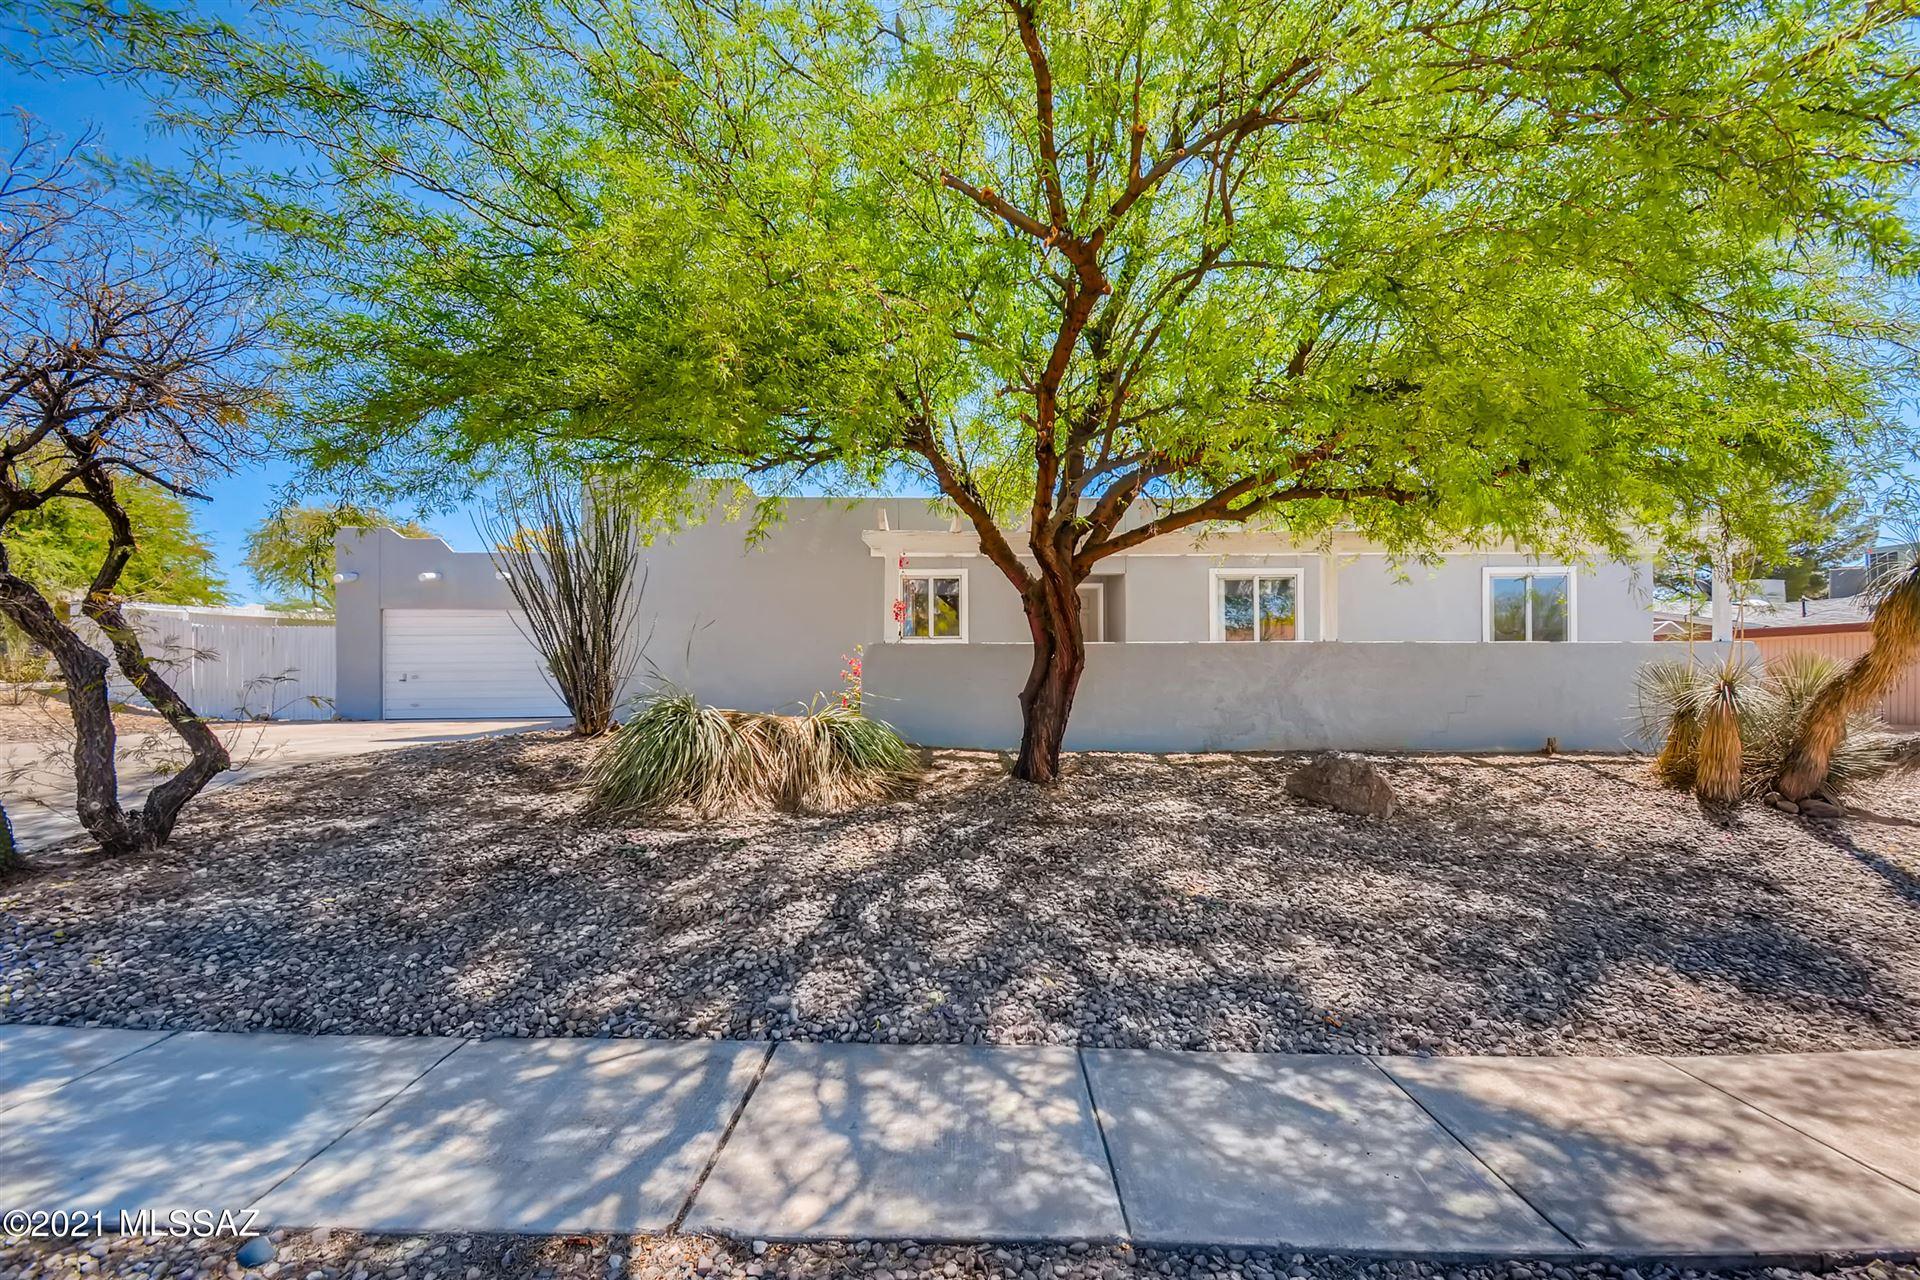 7350 N Iron Bell Place, Tucson, AZ 85741 - MLS#: 22110153